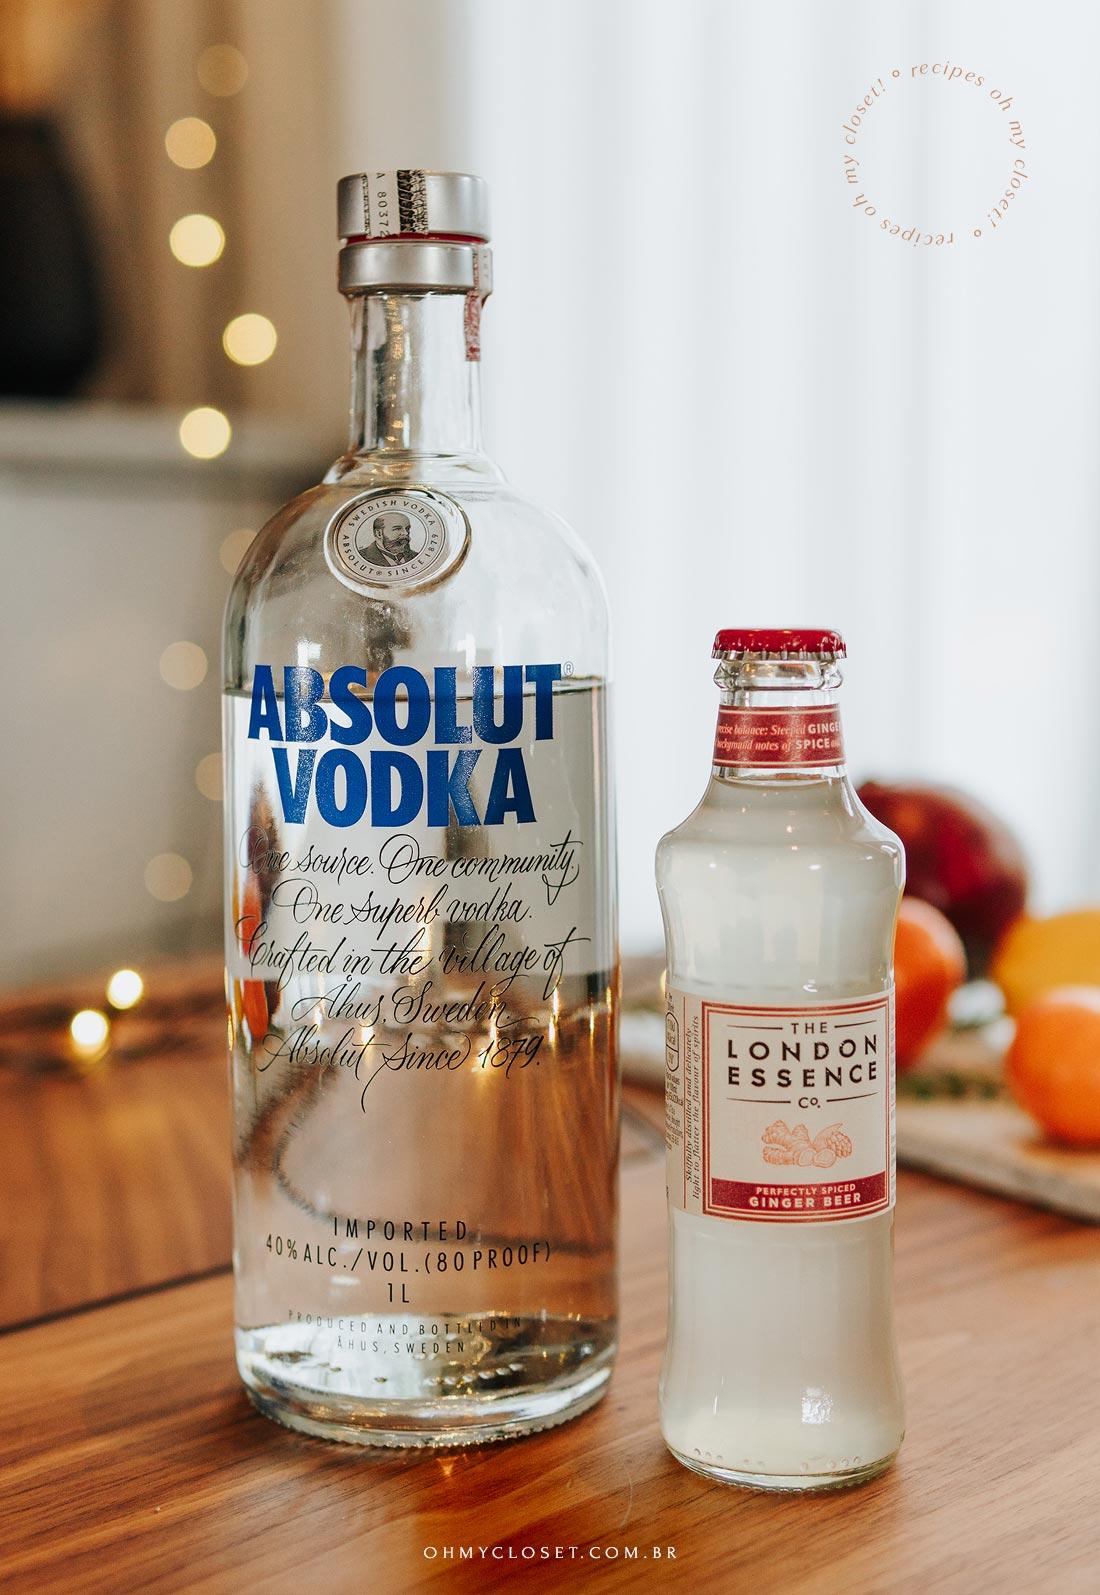 Ingrediente para drink cítrico, vodka Absolut e ginger beer London Essence.